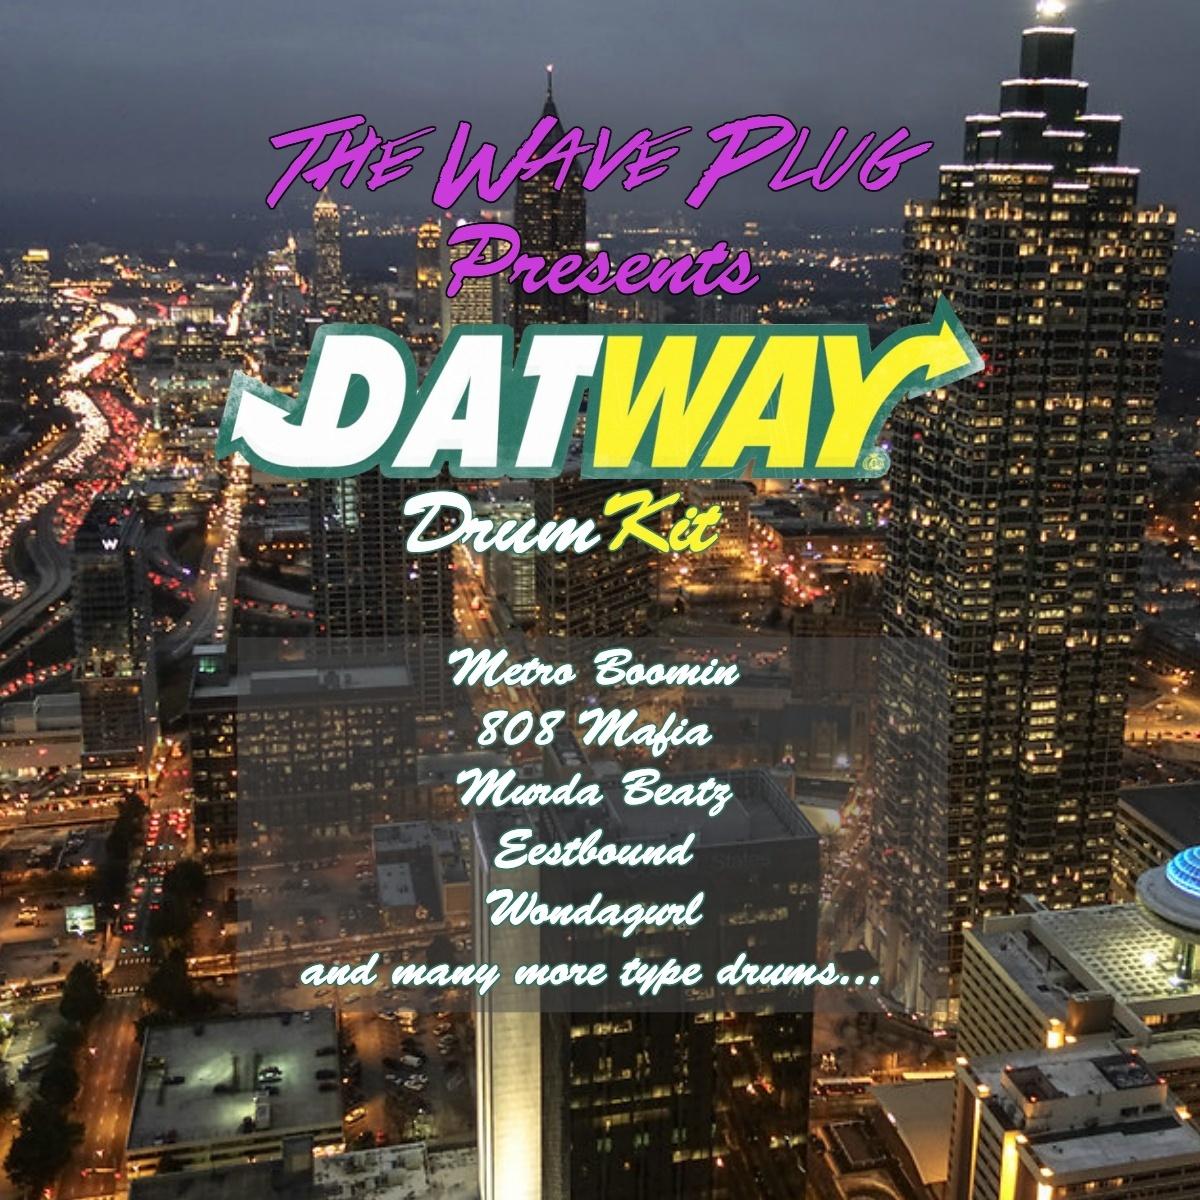 The Wave Plug presents Datway Drumkit